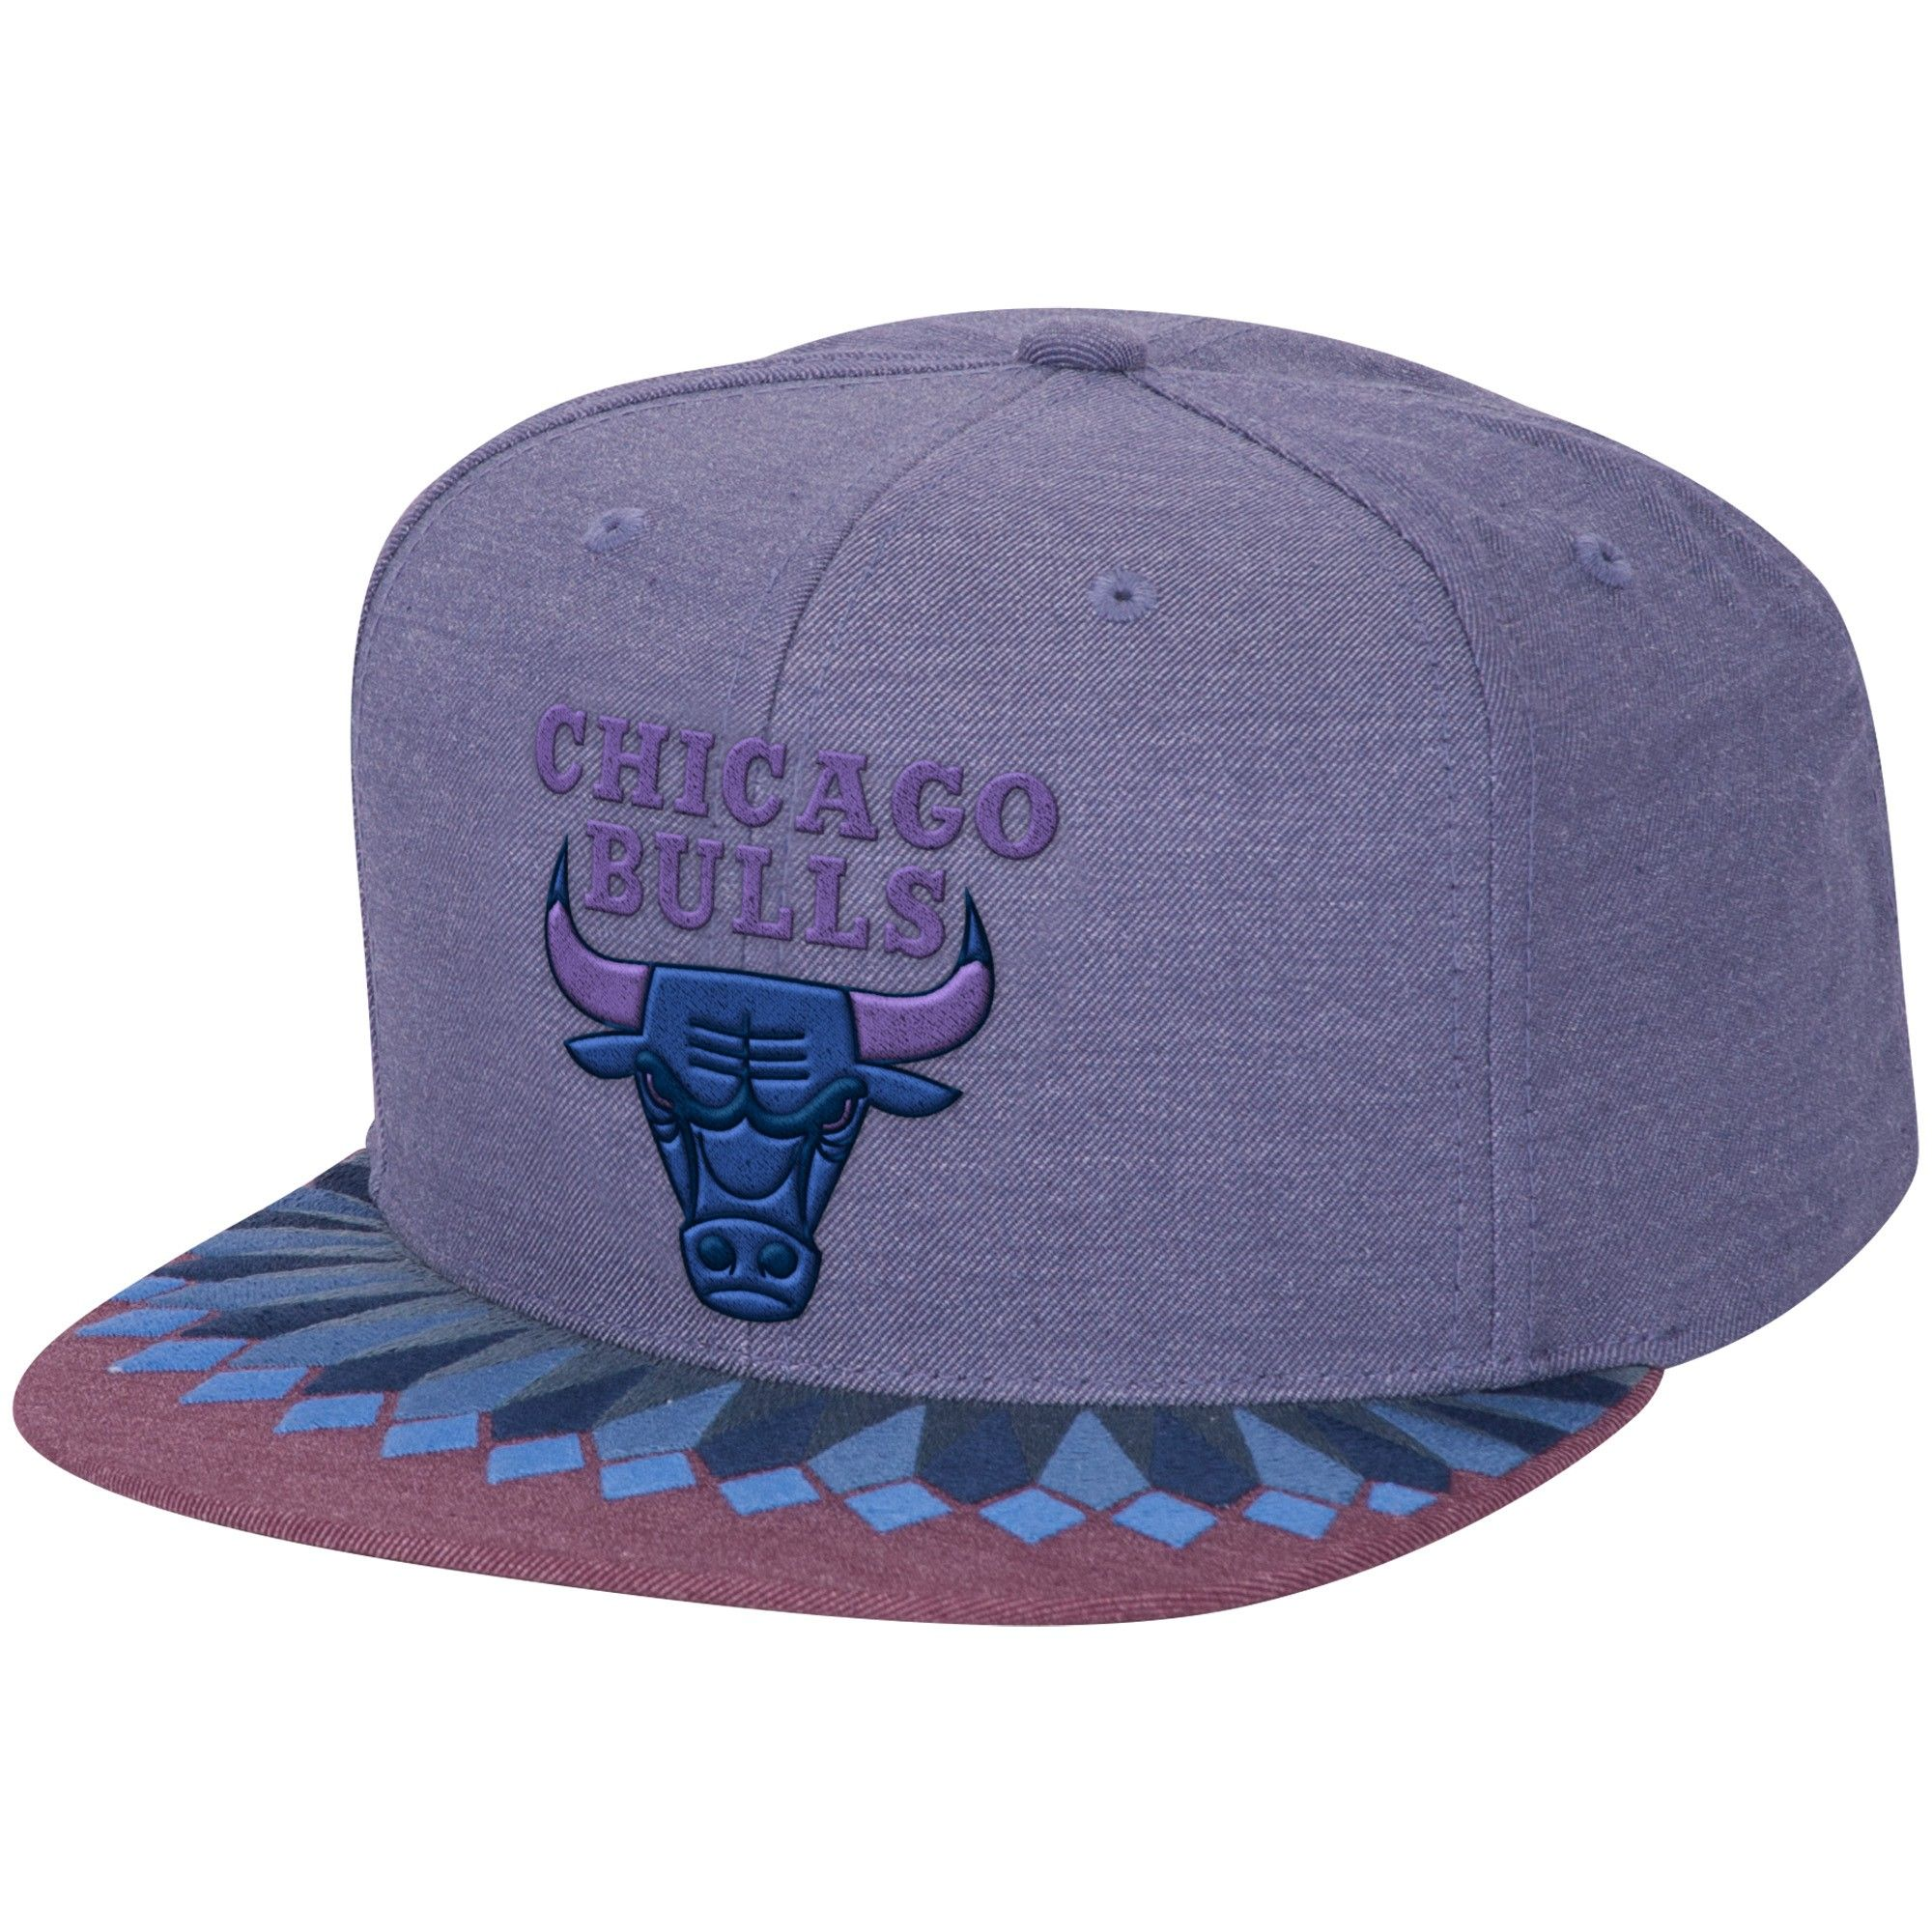 a7a67cfb527 Variant Snapback Chicago Bulls - Shop Mitchell   Ness NBA Strapbacks and  Headwear